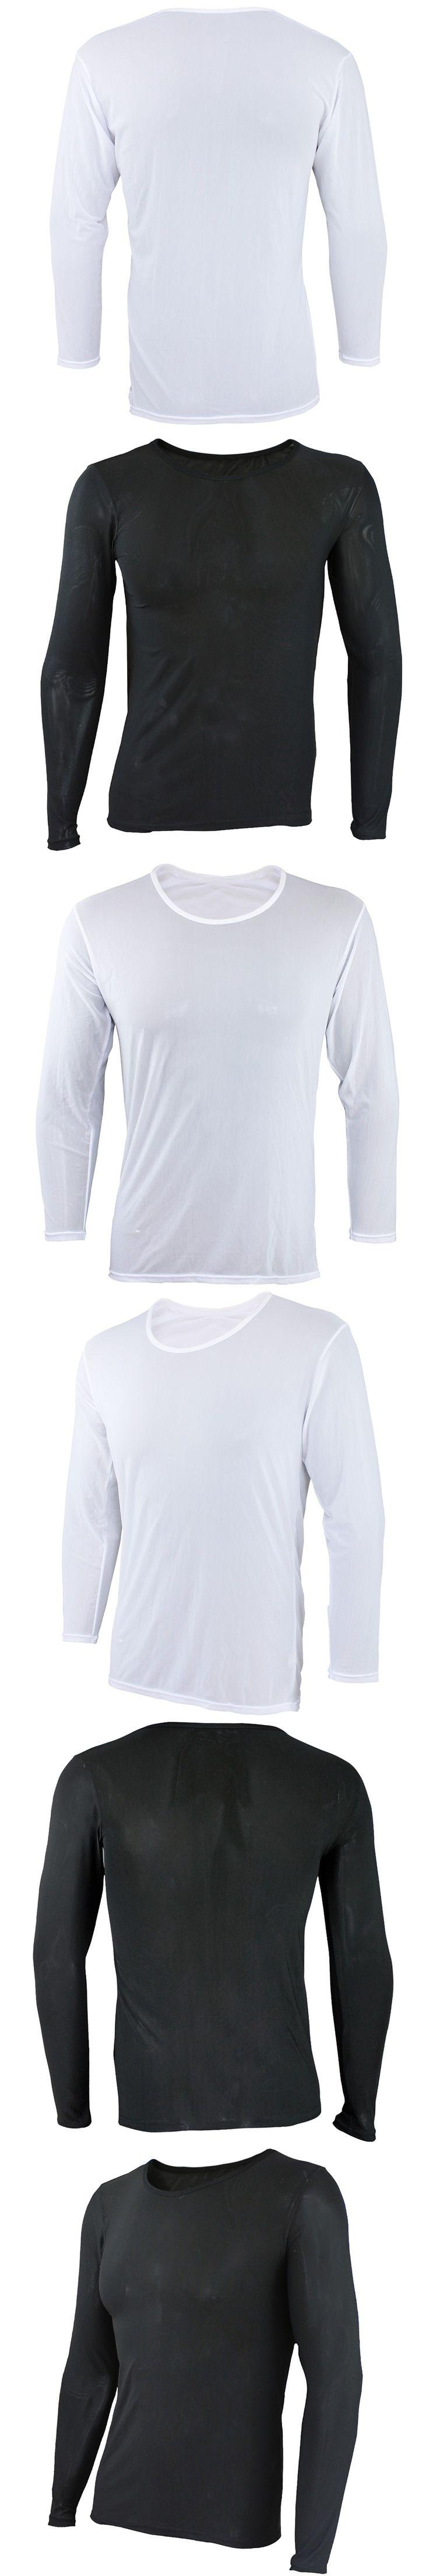 iEFiEL Sexy Mens Long Sleeves Mesh Underwear Cloth Full T-shirt Undershirt Nightwear Tops Tees O-Neck Clothing